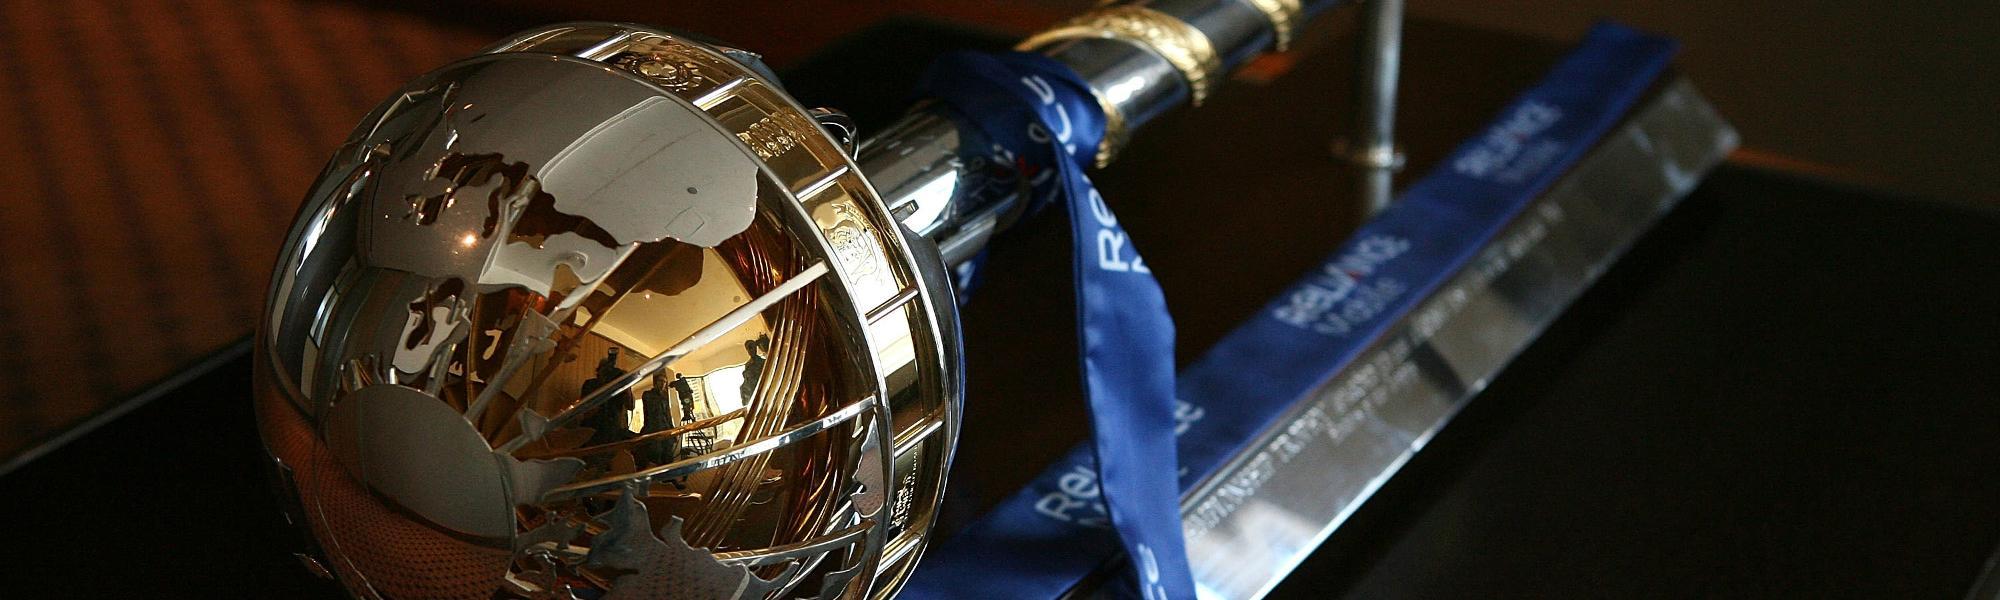 The ICC Test Championship mace